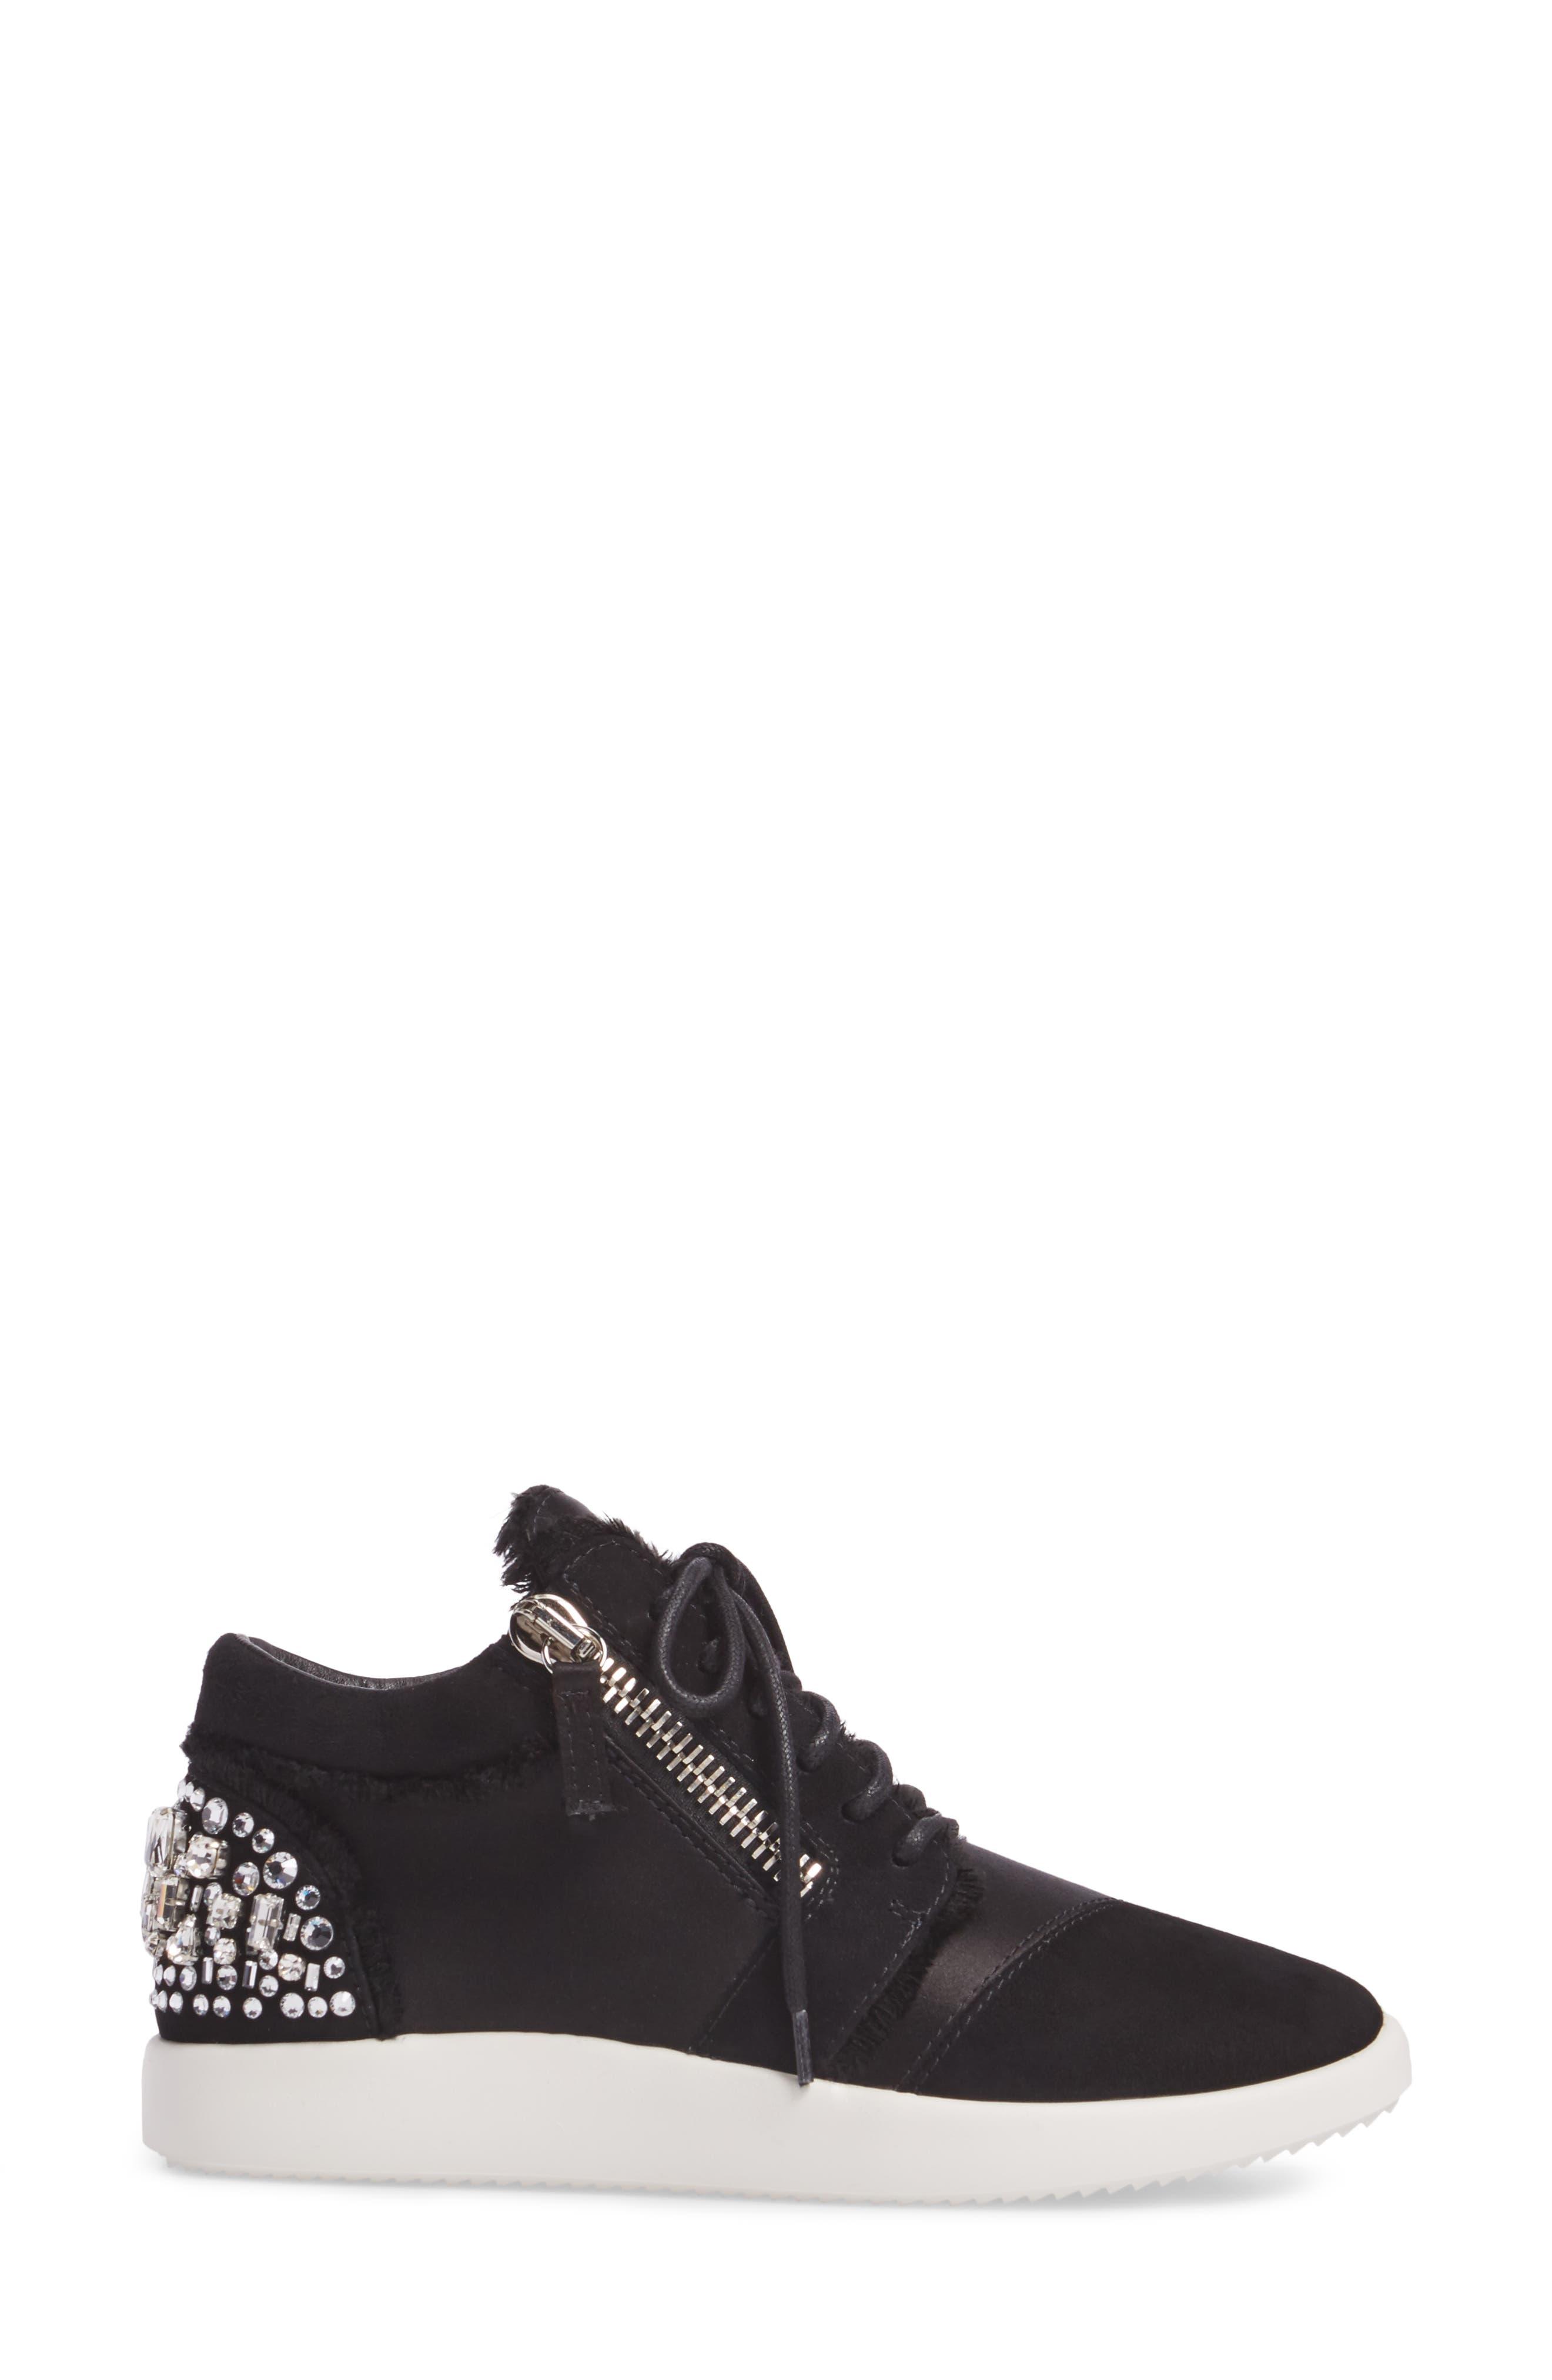 Alternate Image 3  - Giuseppe Zanotti Swarovski Crystal Embellished Sneaker (Women)